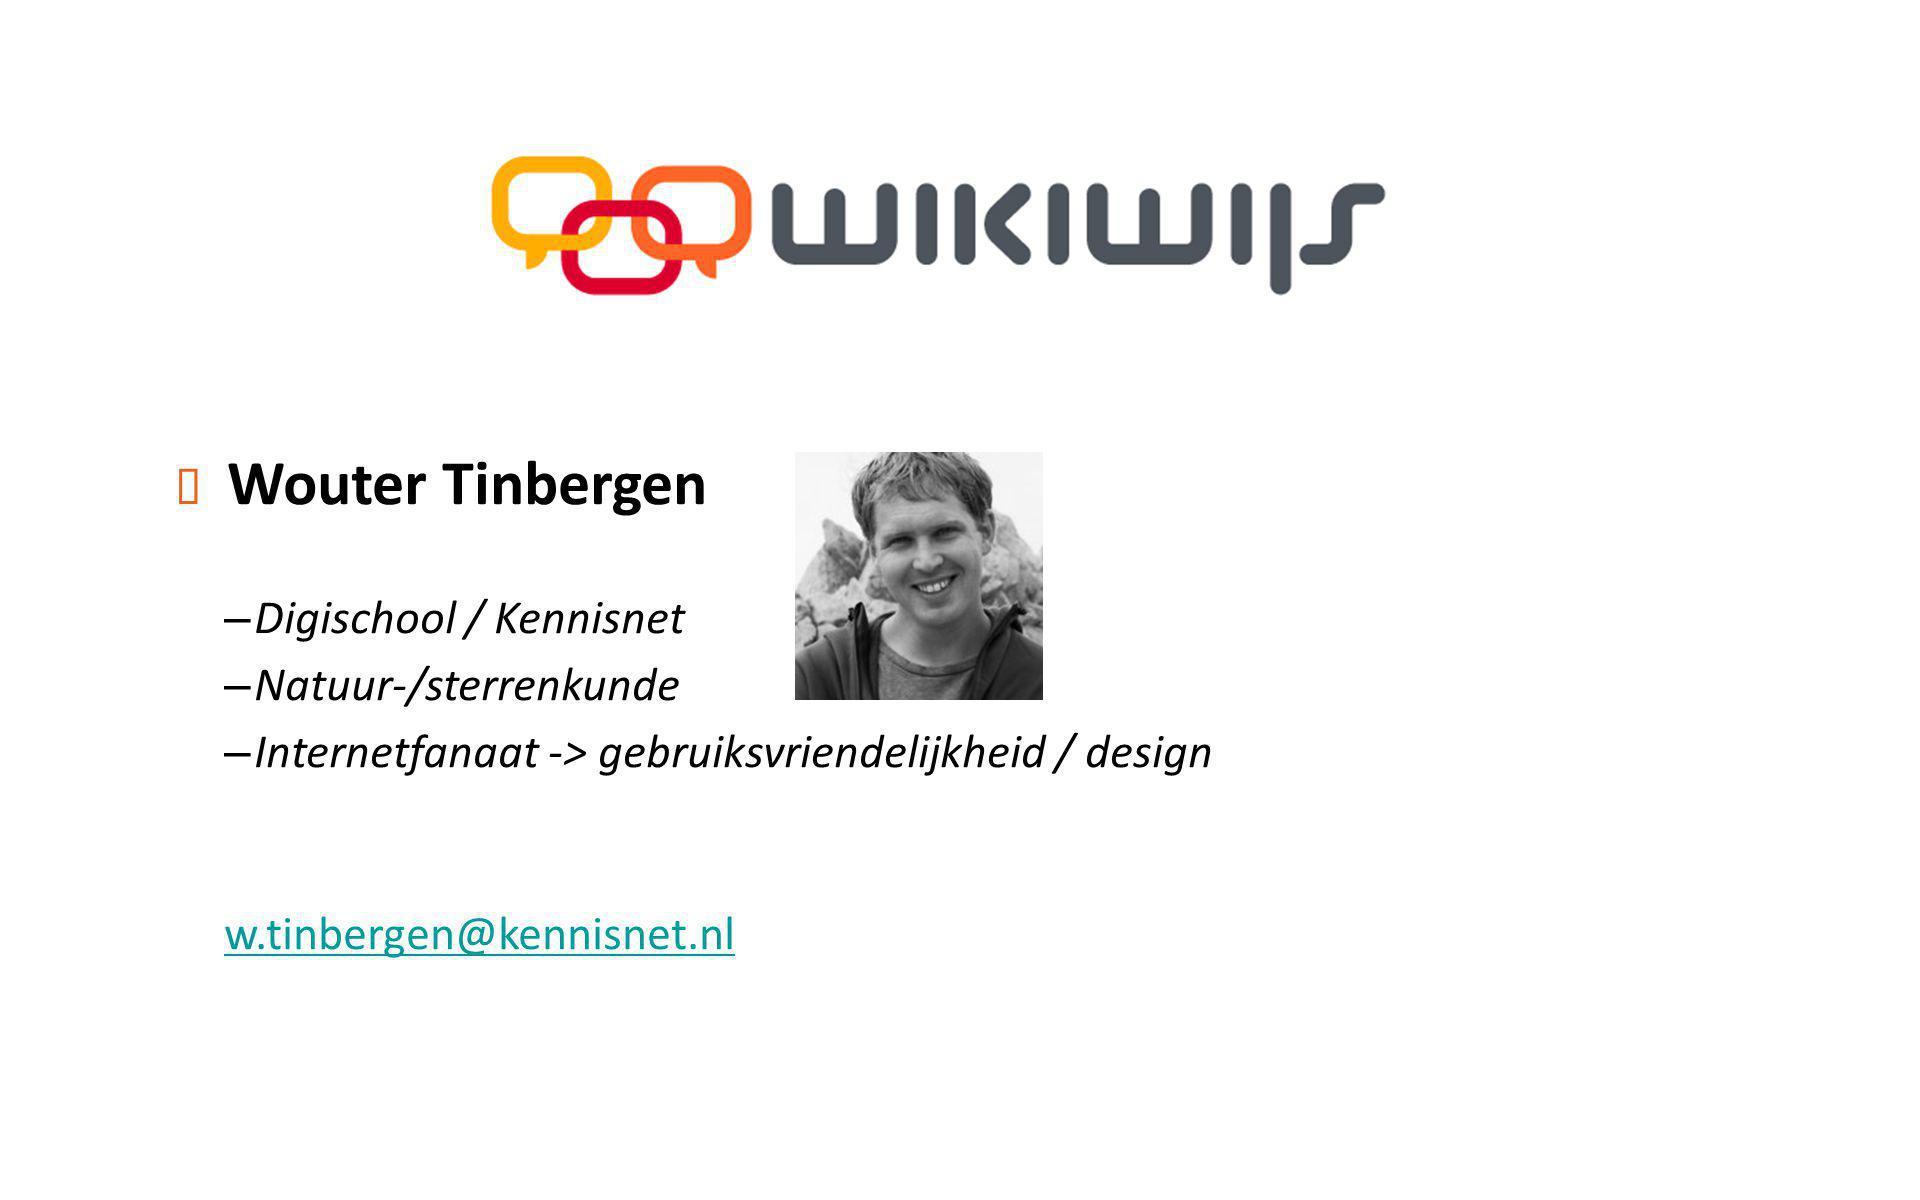 Wouter Tinbergen Digischool / Kennisnet Natuur-/sterrenkunde